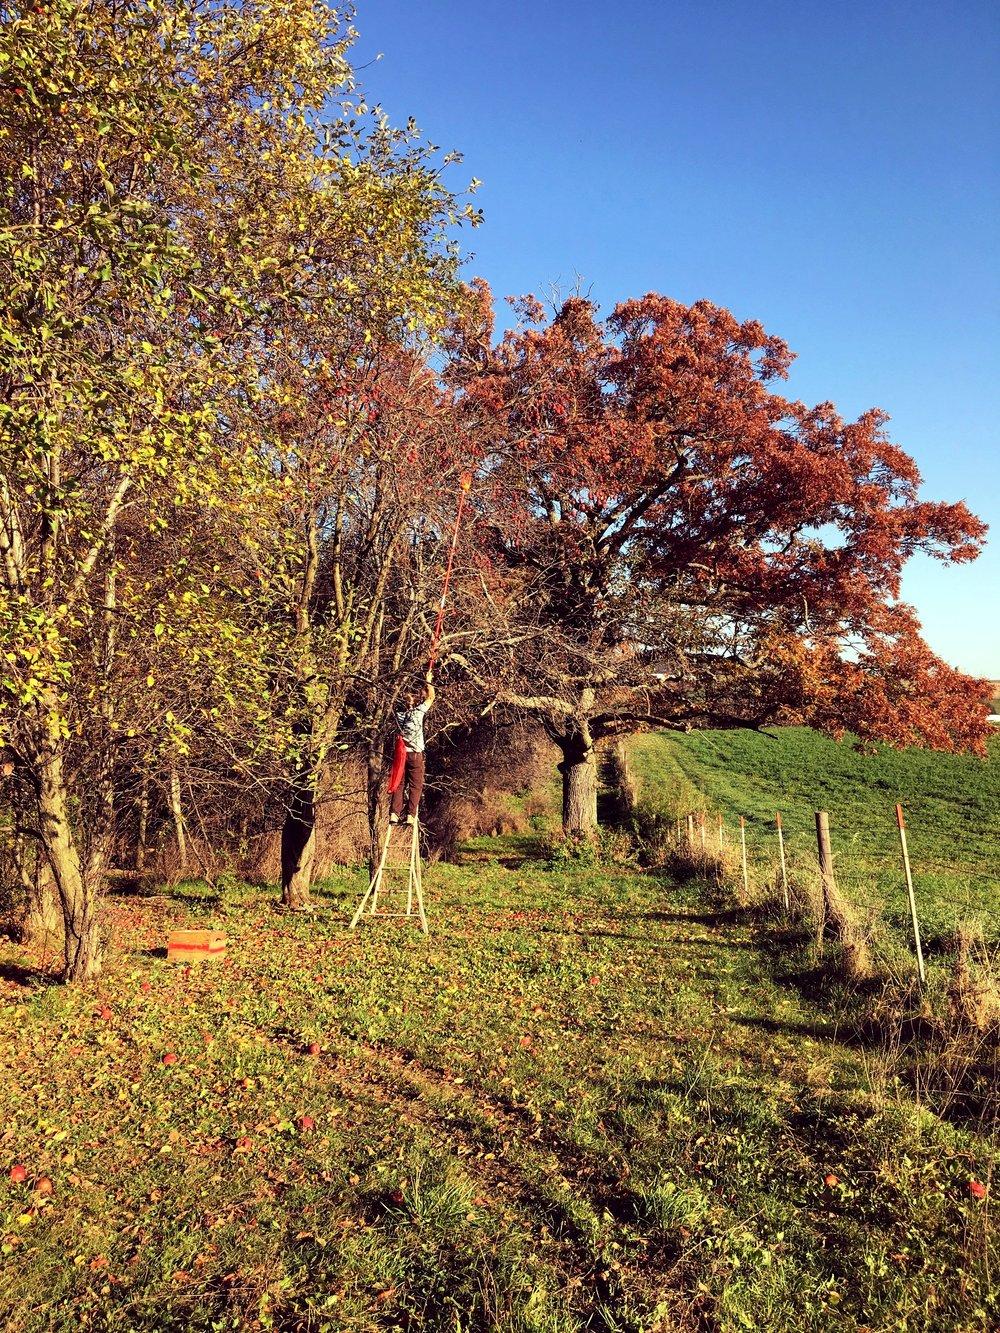 Above: Matt on a ladder picking from a wild apple tree